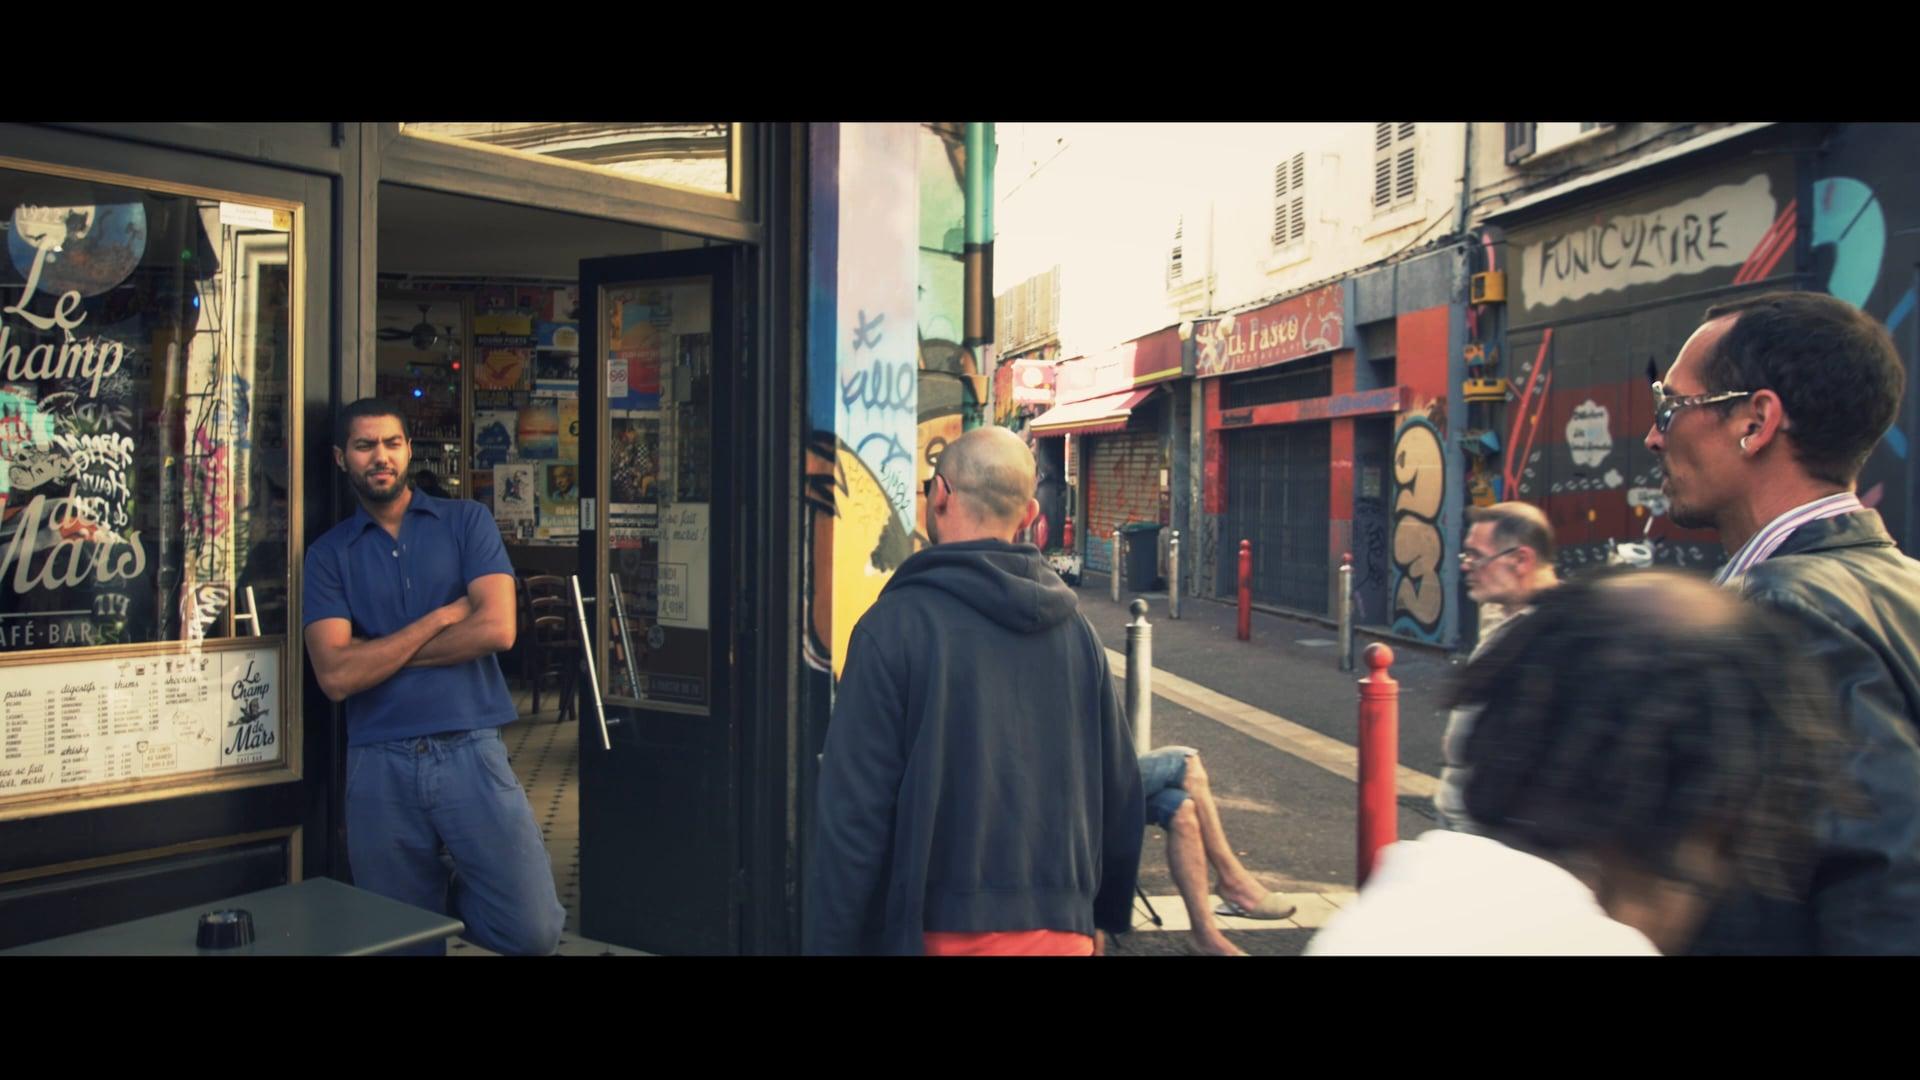 Kino Fight - Sébastien